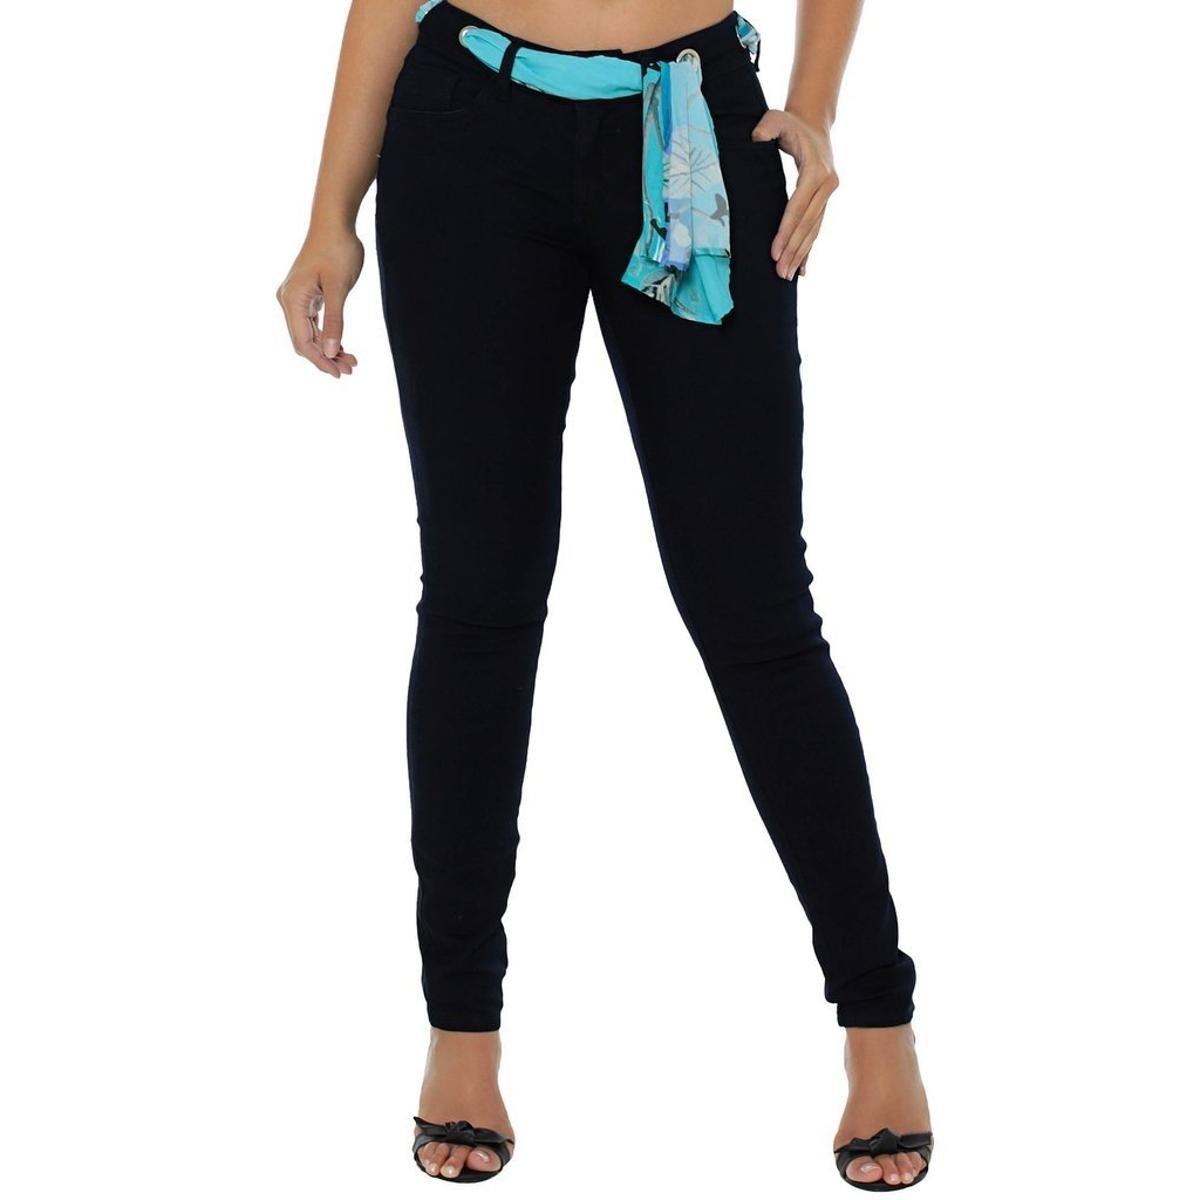 6eec35836 Calça Jeans Eventual Skinny Feminina - Compre Agora | Zattini